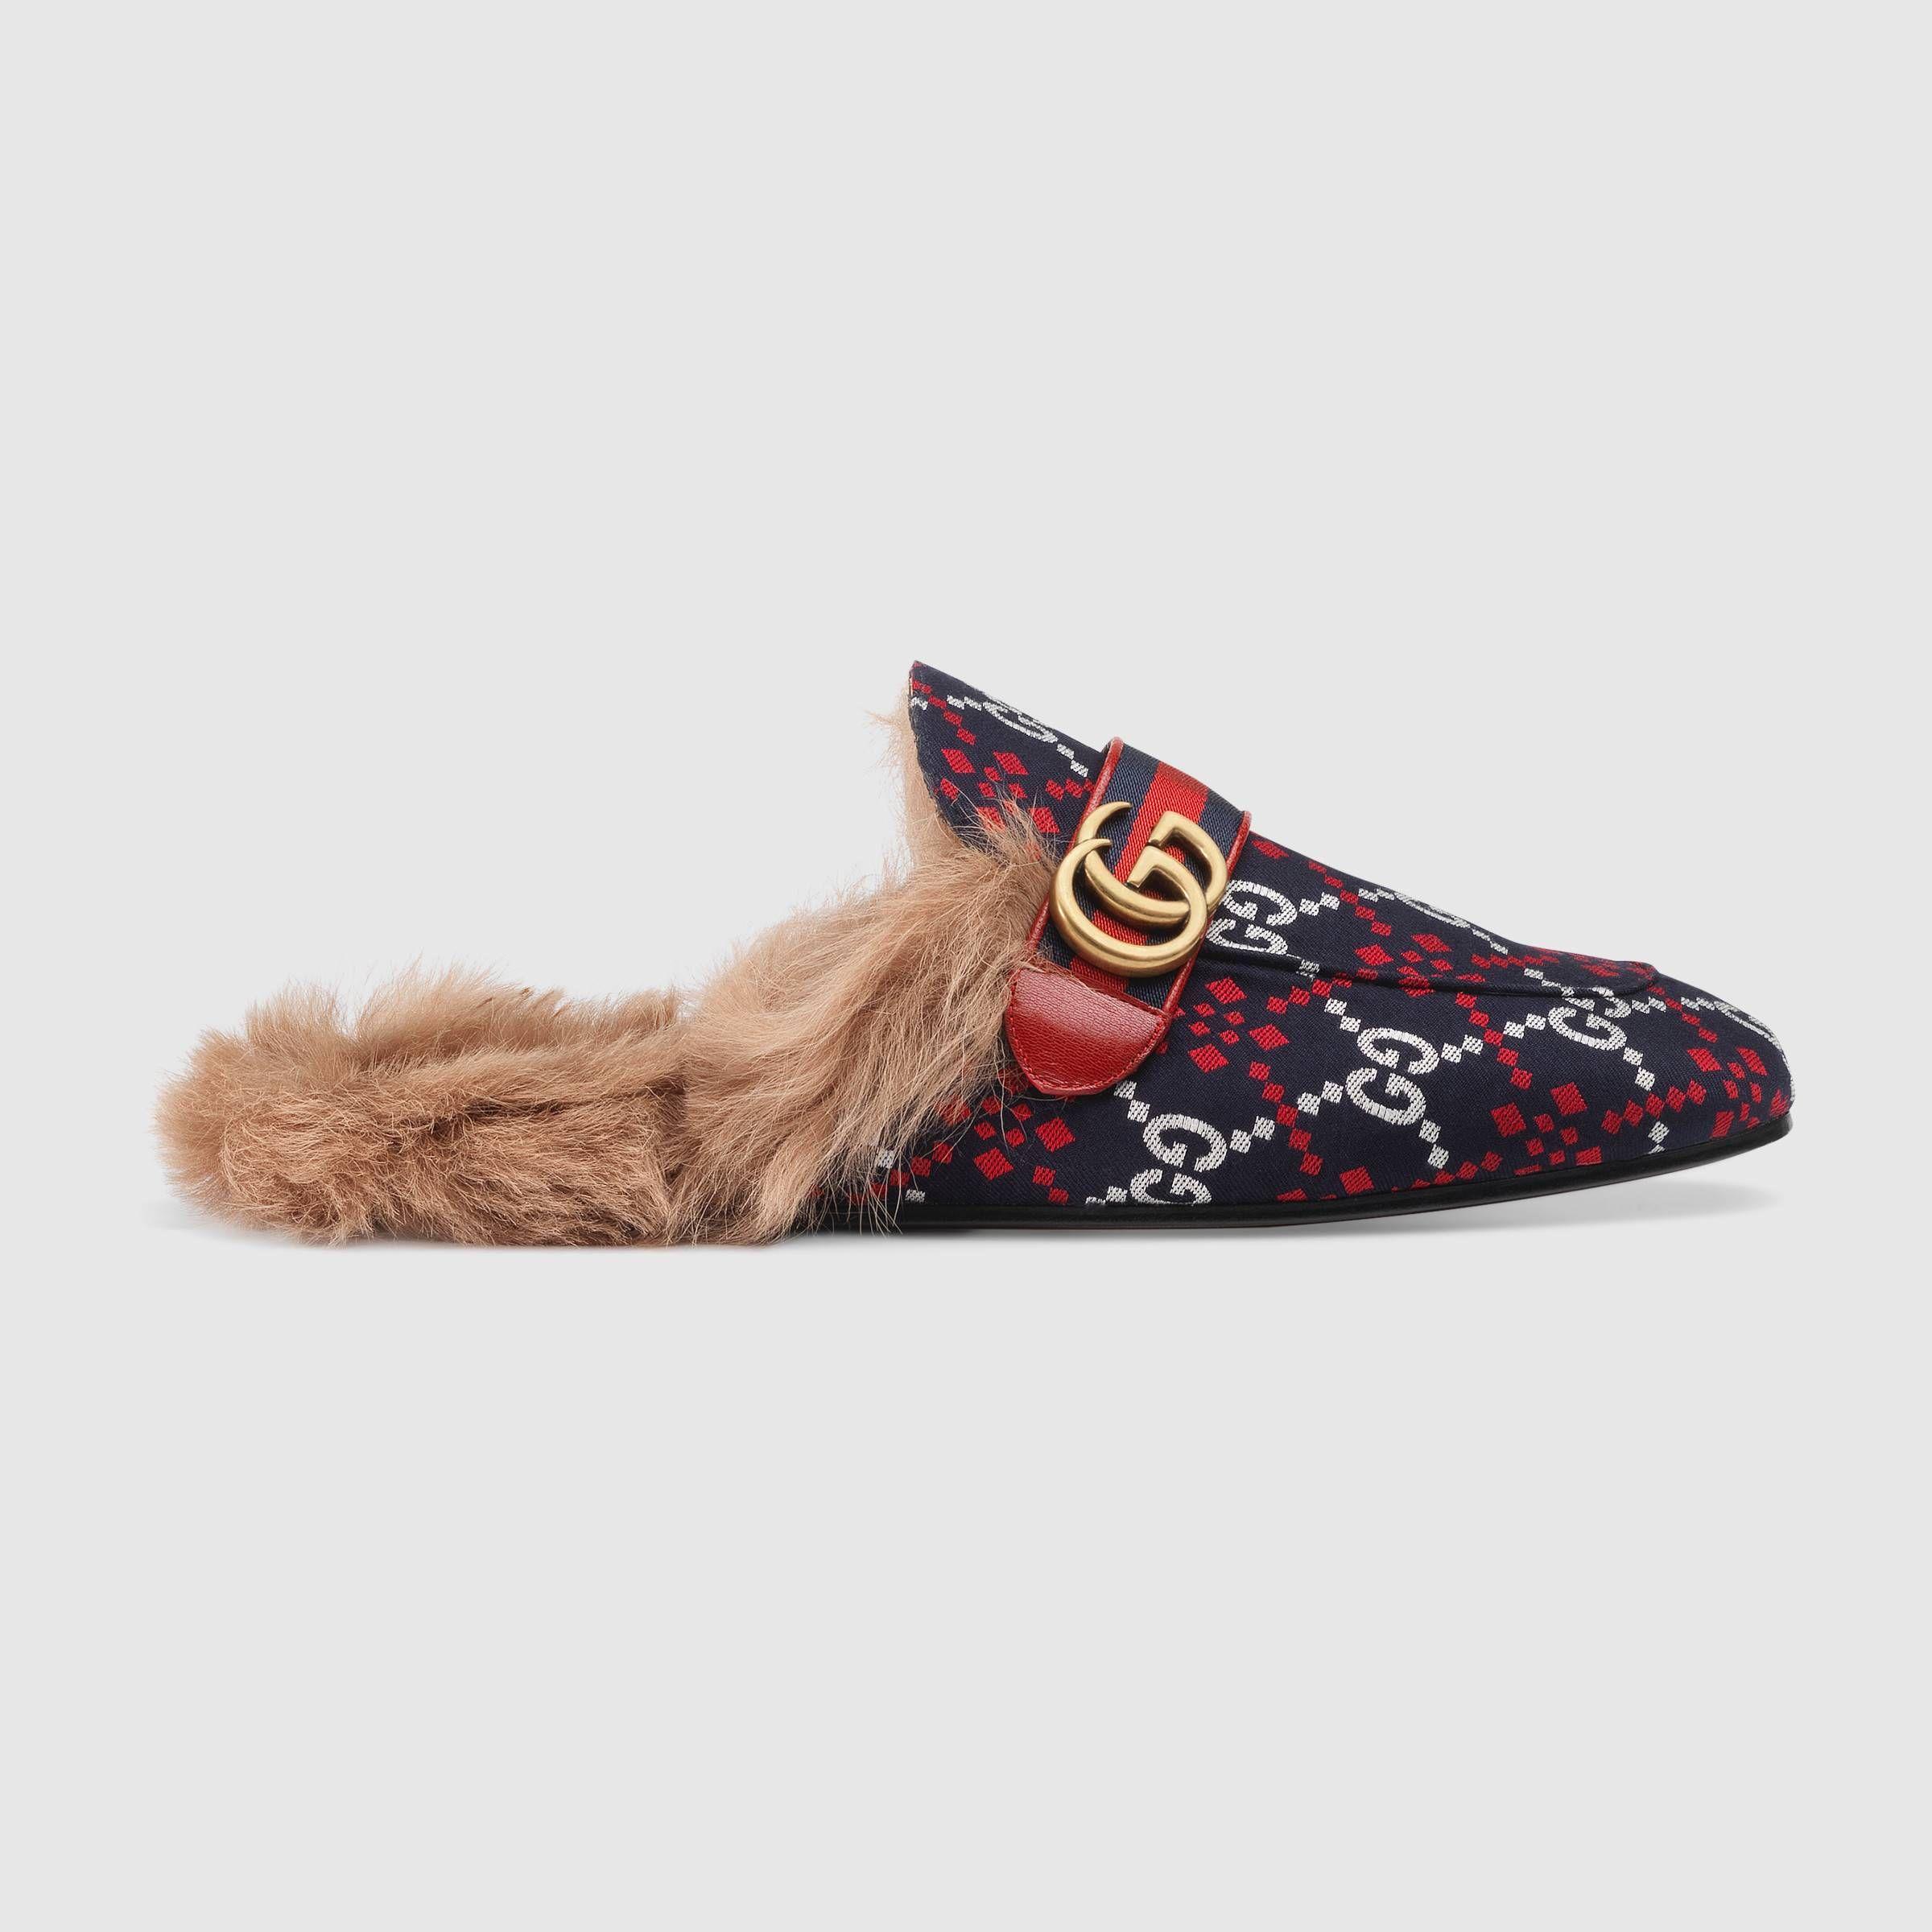 67d8caa8157 GUCCI PRINCETOWN GG DIAMOND SLIPPER.  gucci  shoes